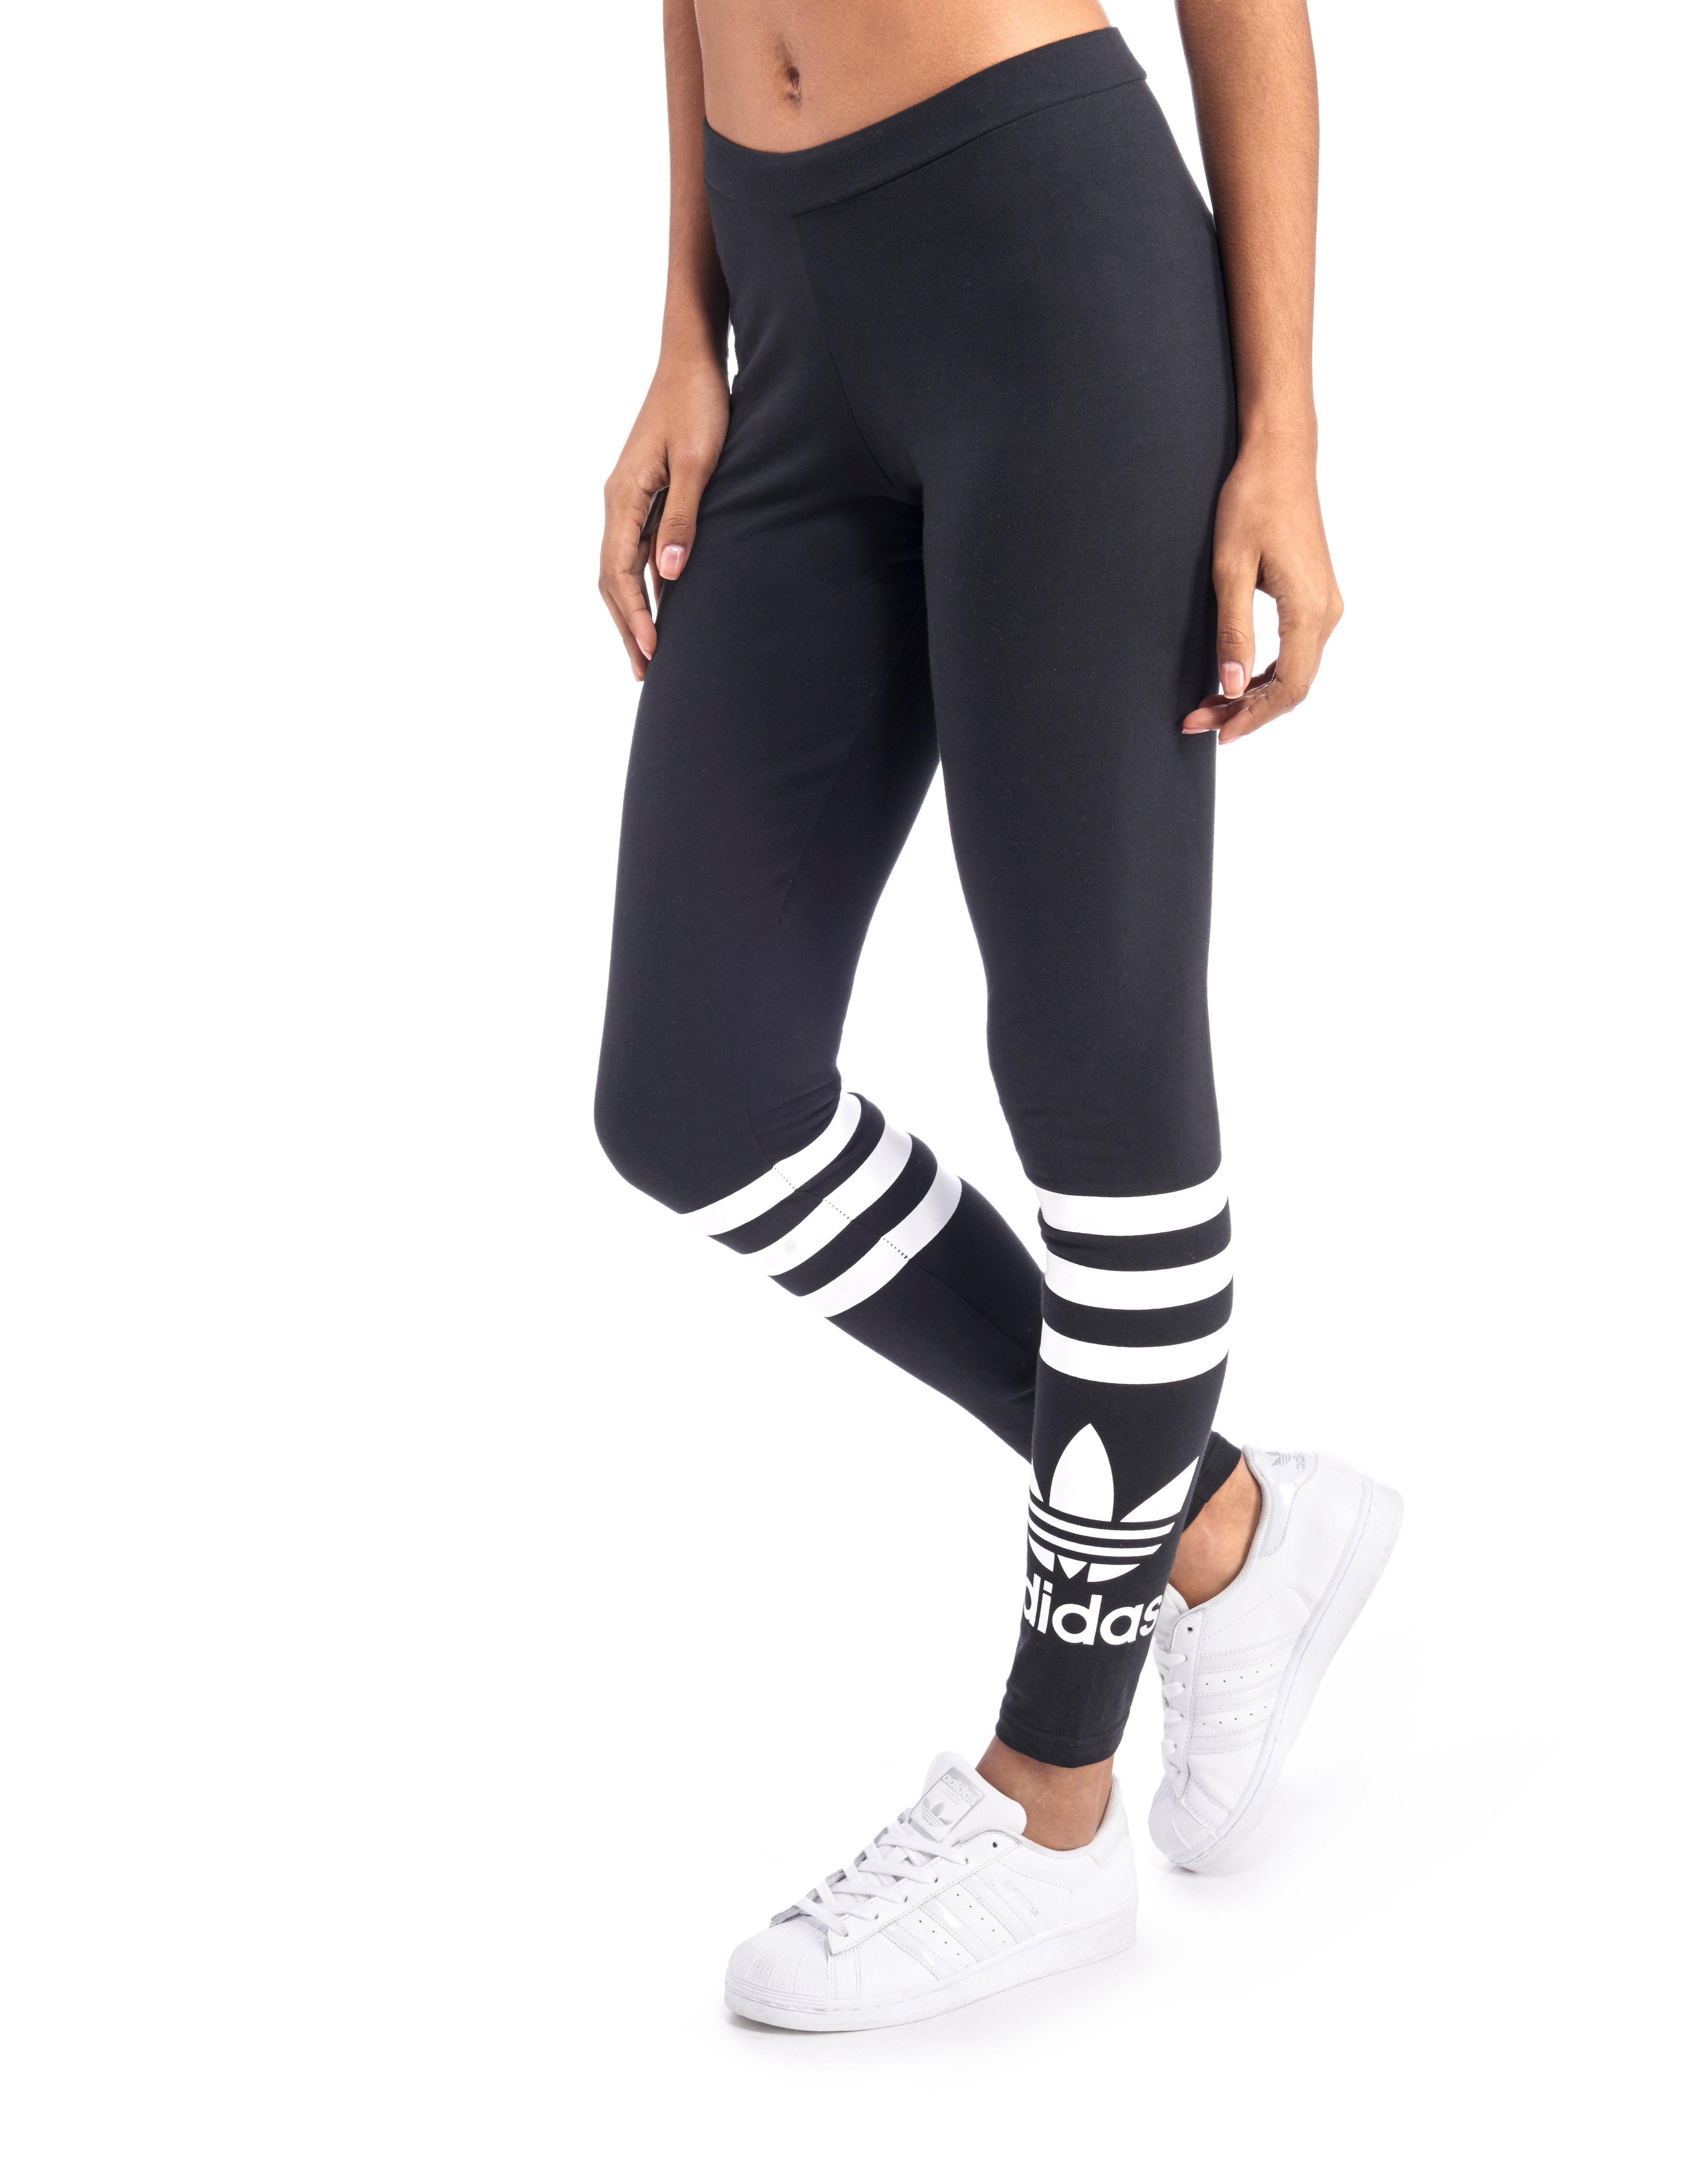 adidas originals street leggings jd sports. Black Bedroom Furniture Sets. Home Design Ideas